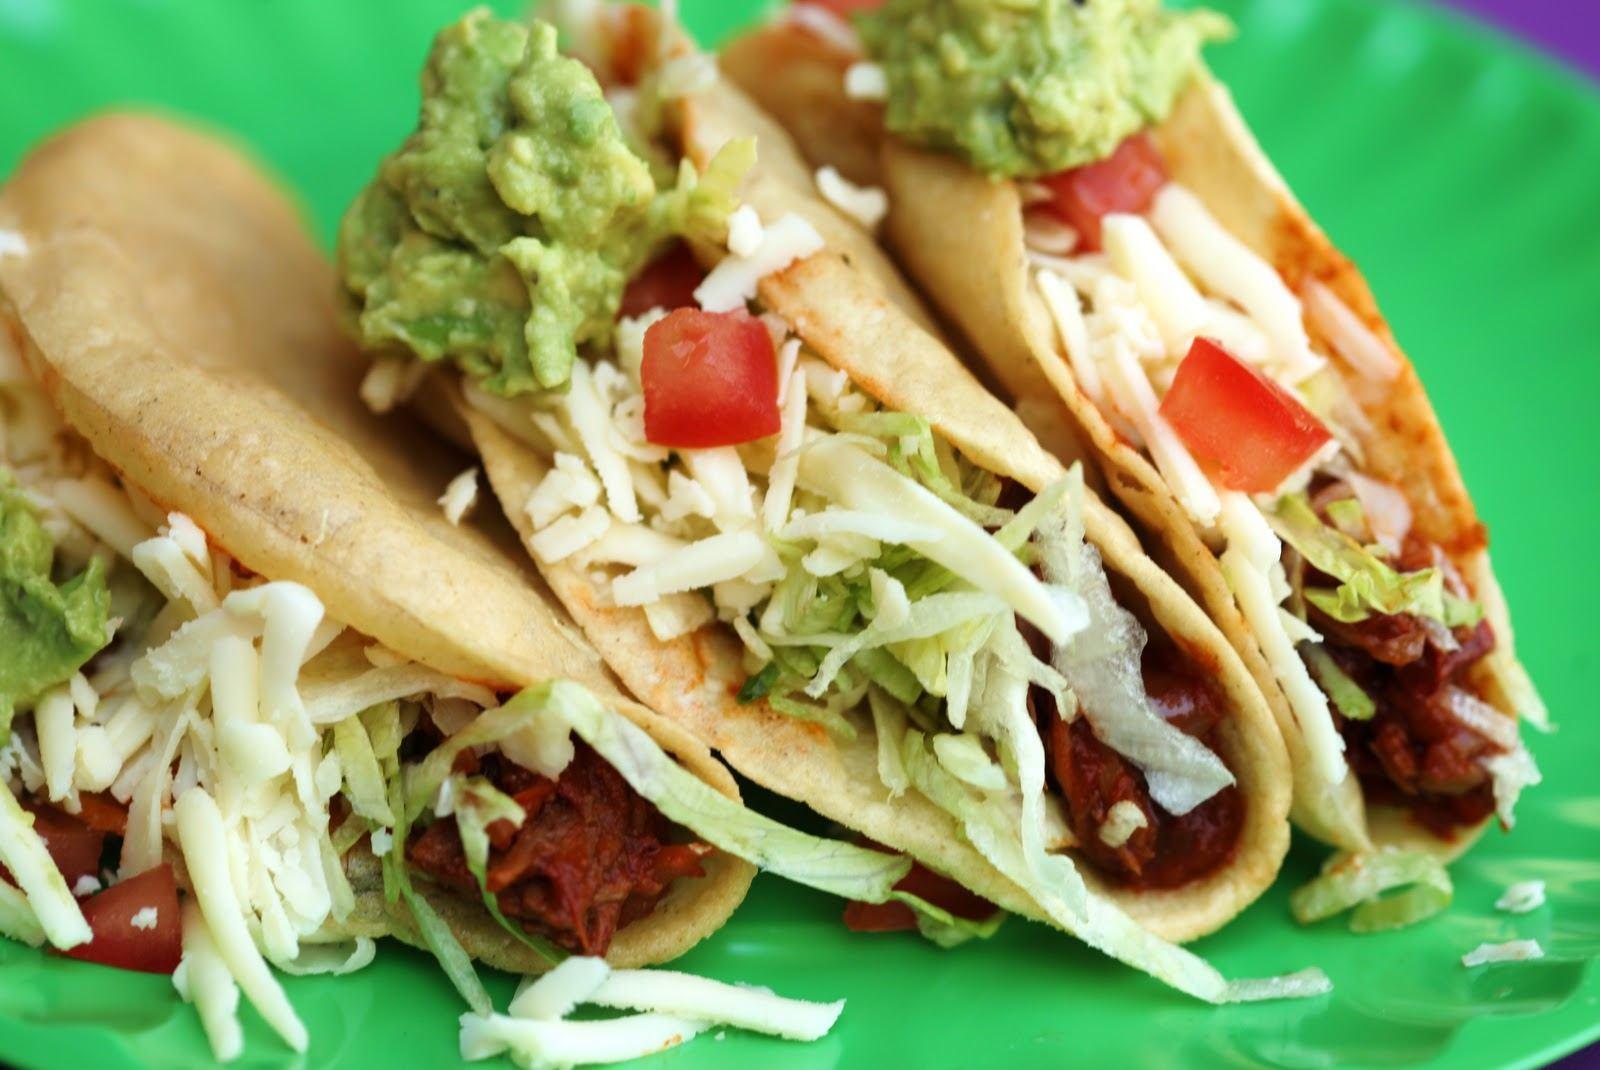 Making Tacos Amp Learning Spanish